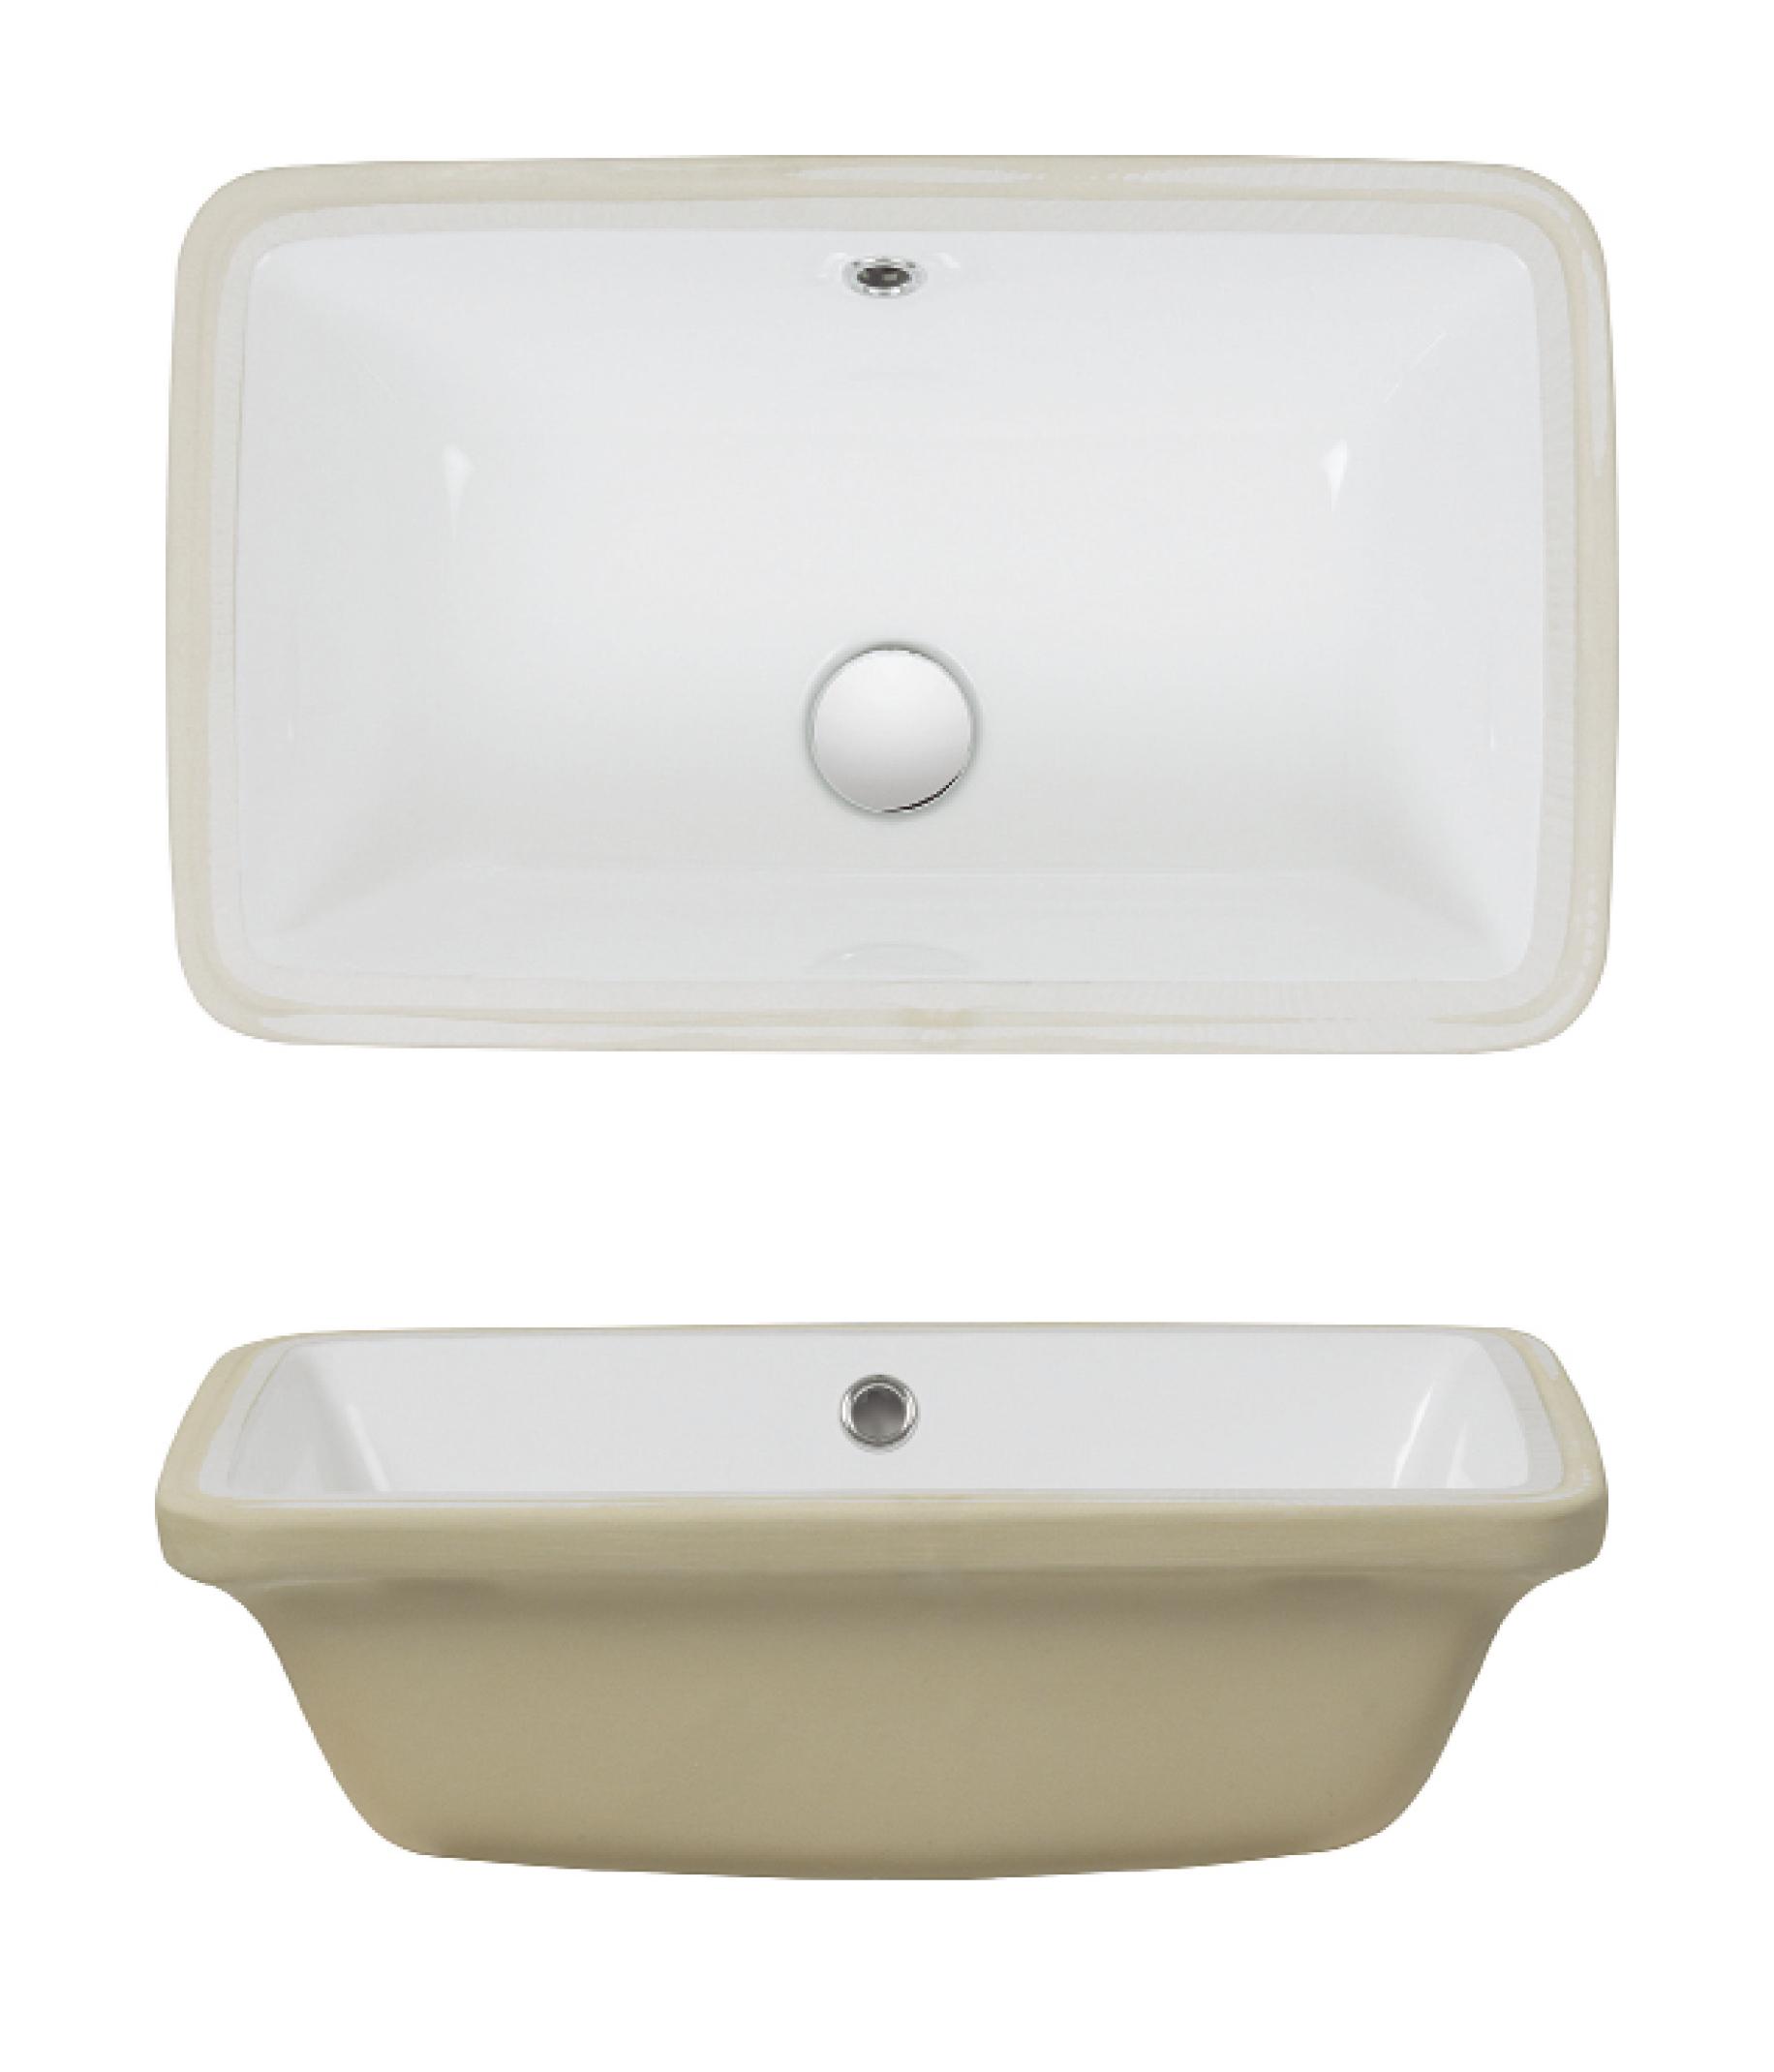 tile pin bathtub bathtubs deck custom the undermount tub master paneled nora with front